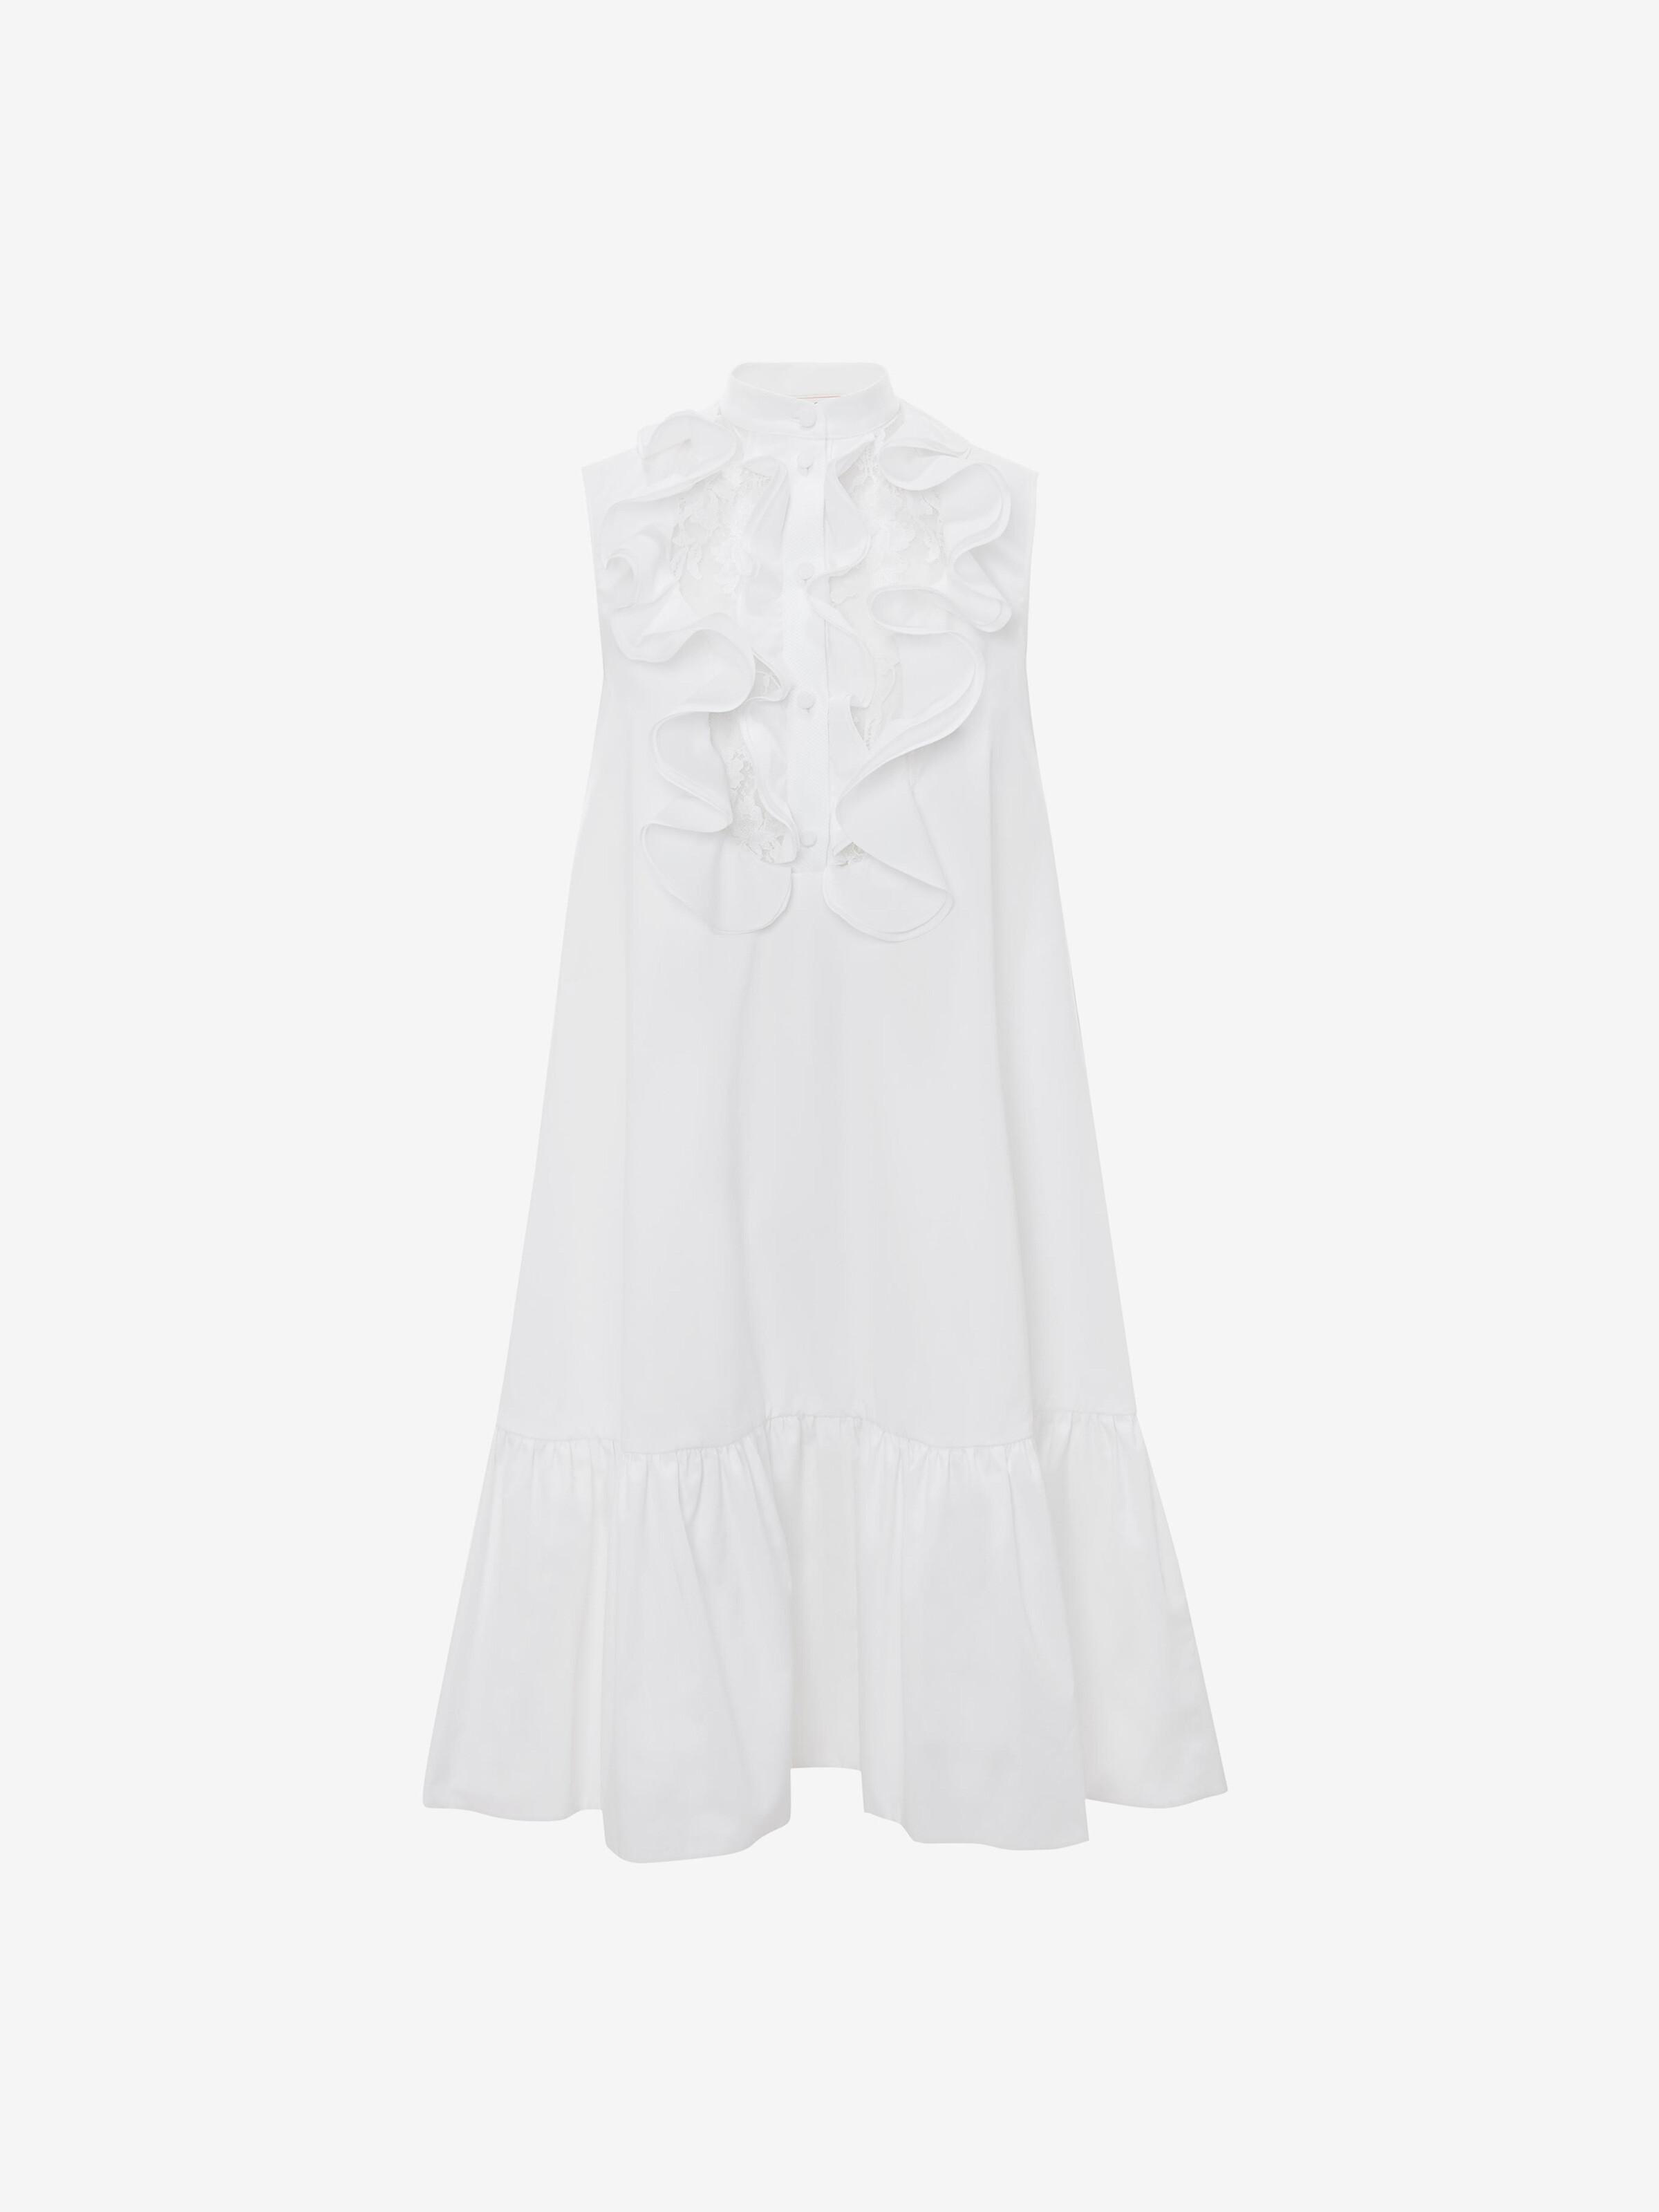 Alexander Mcqueen Lace Cotton Poplin Mini Dress In Optical White